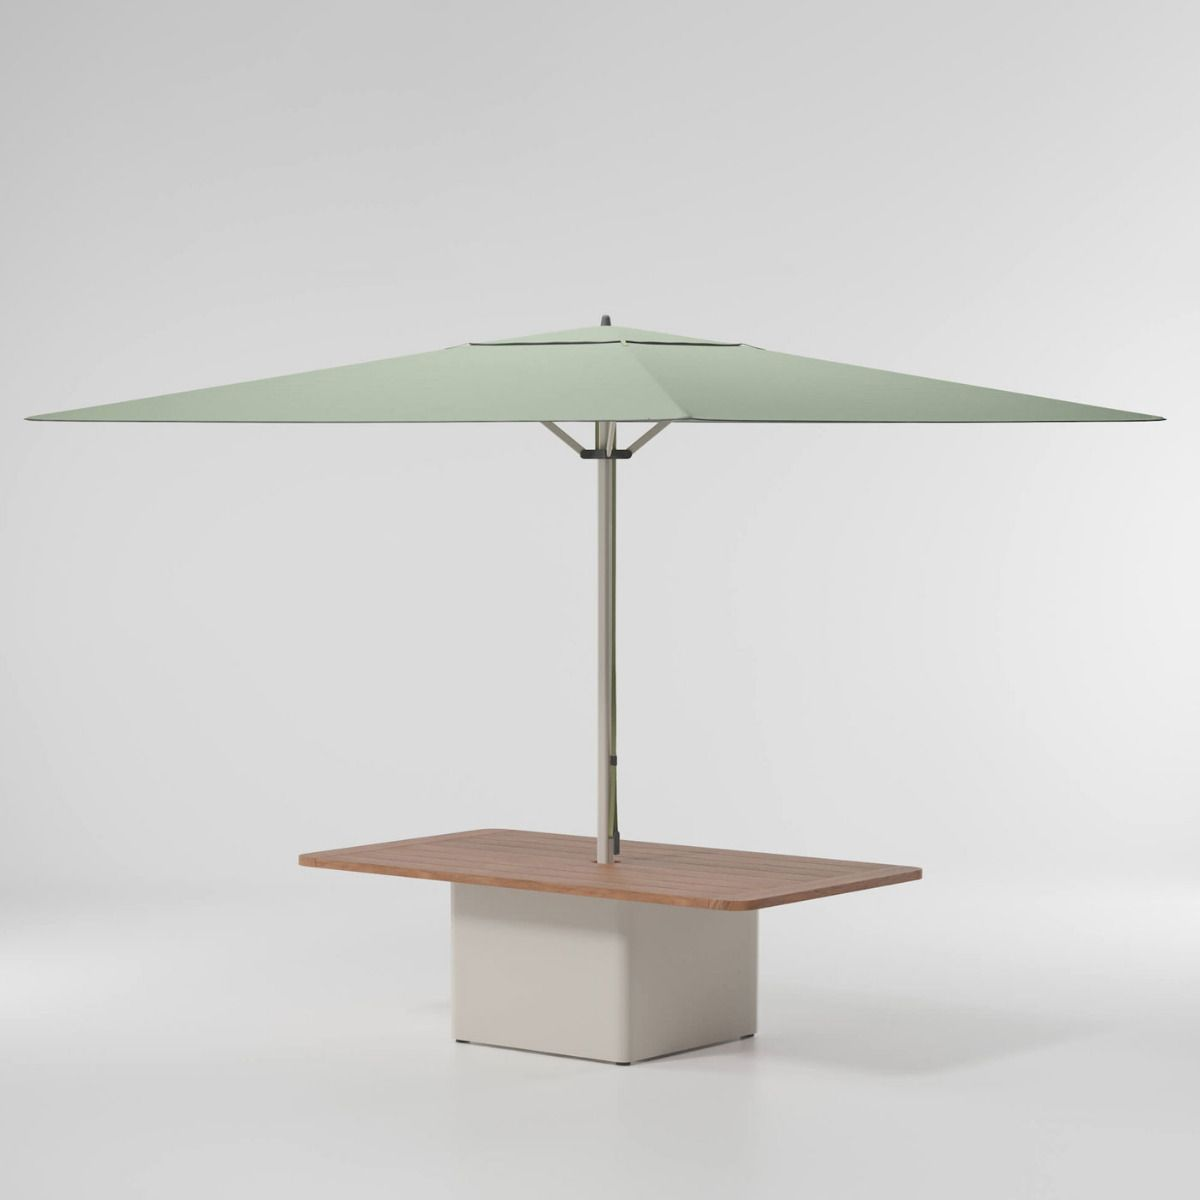 Meteo Steel Centre Table Base Parasol